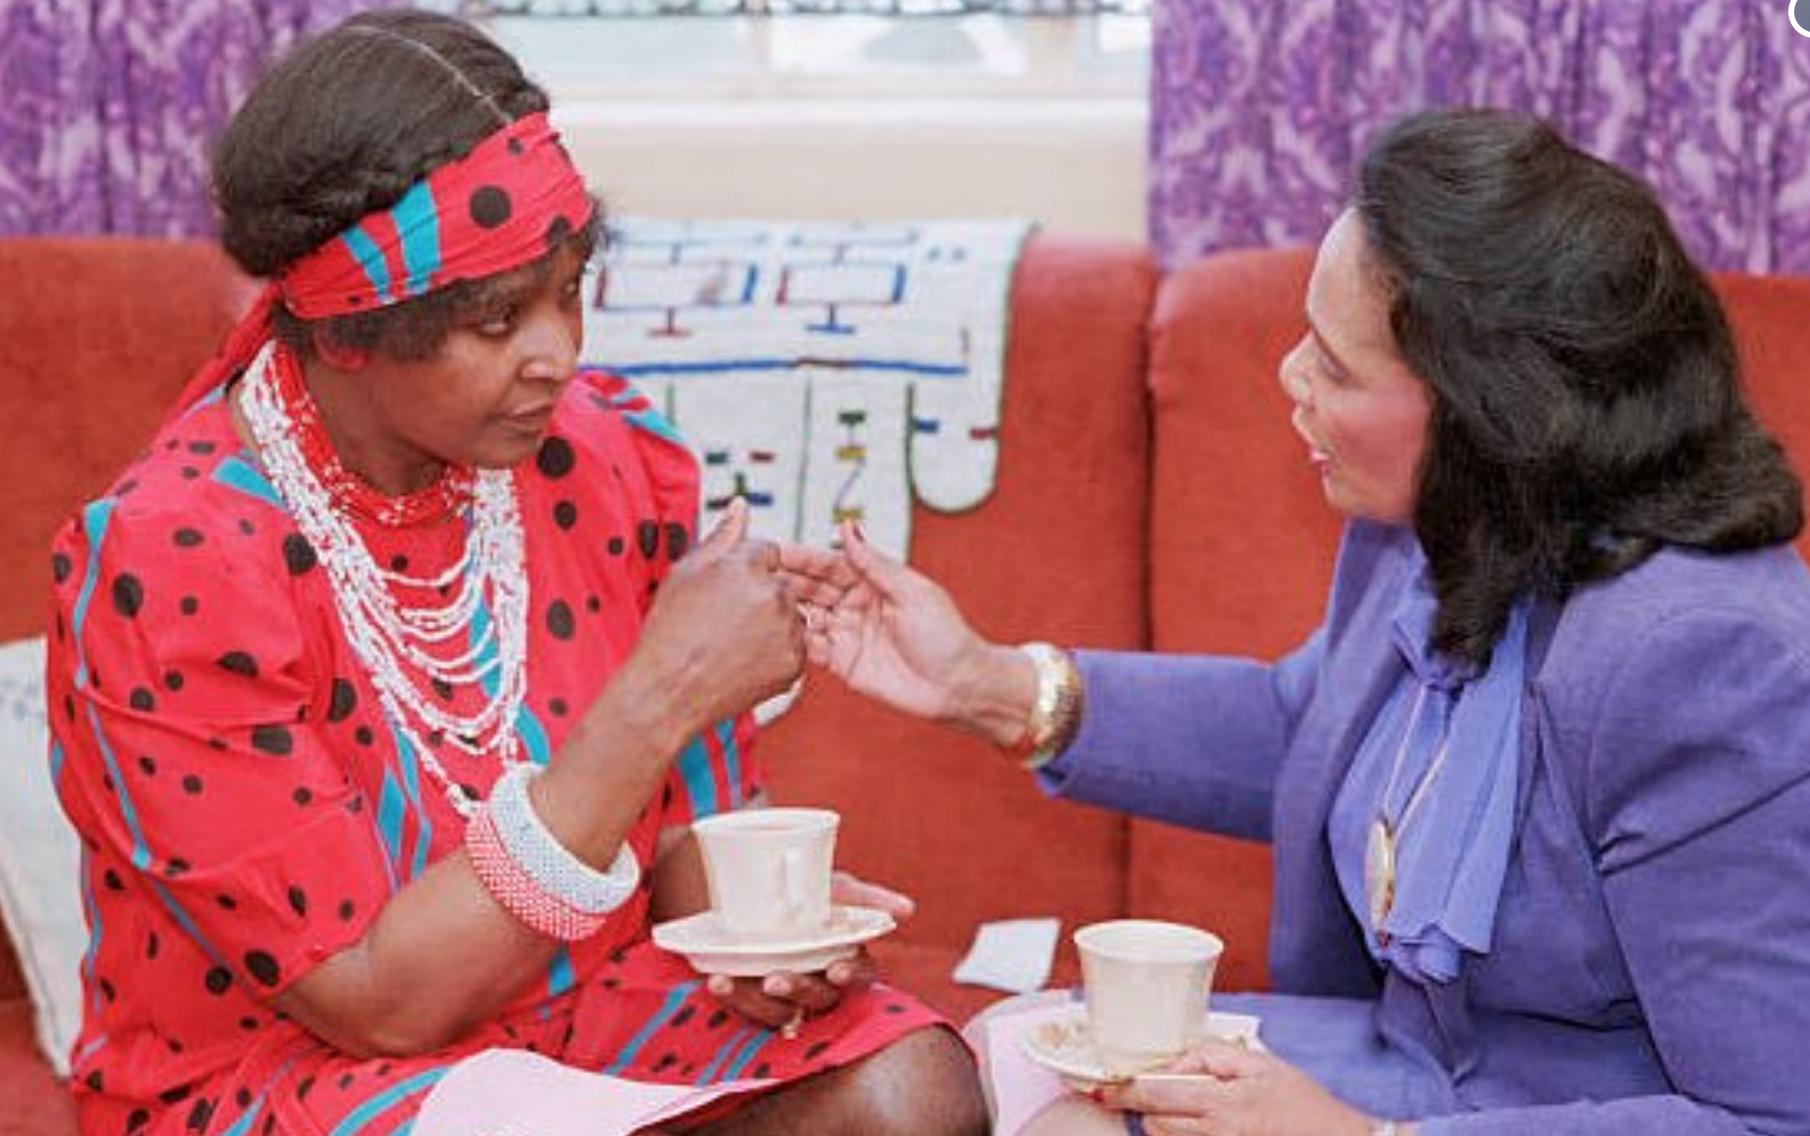 04/03/18 : Remembering Winnie Madikizela-Mandela on social media